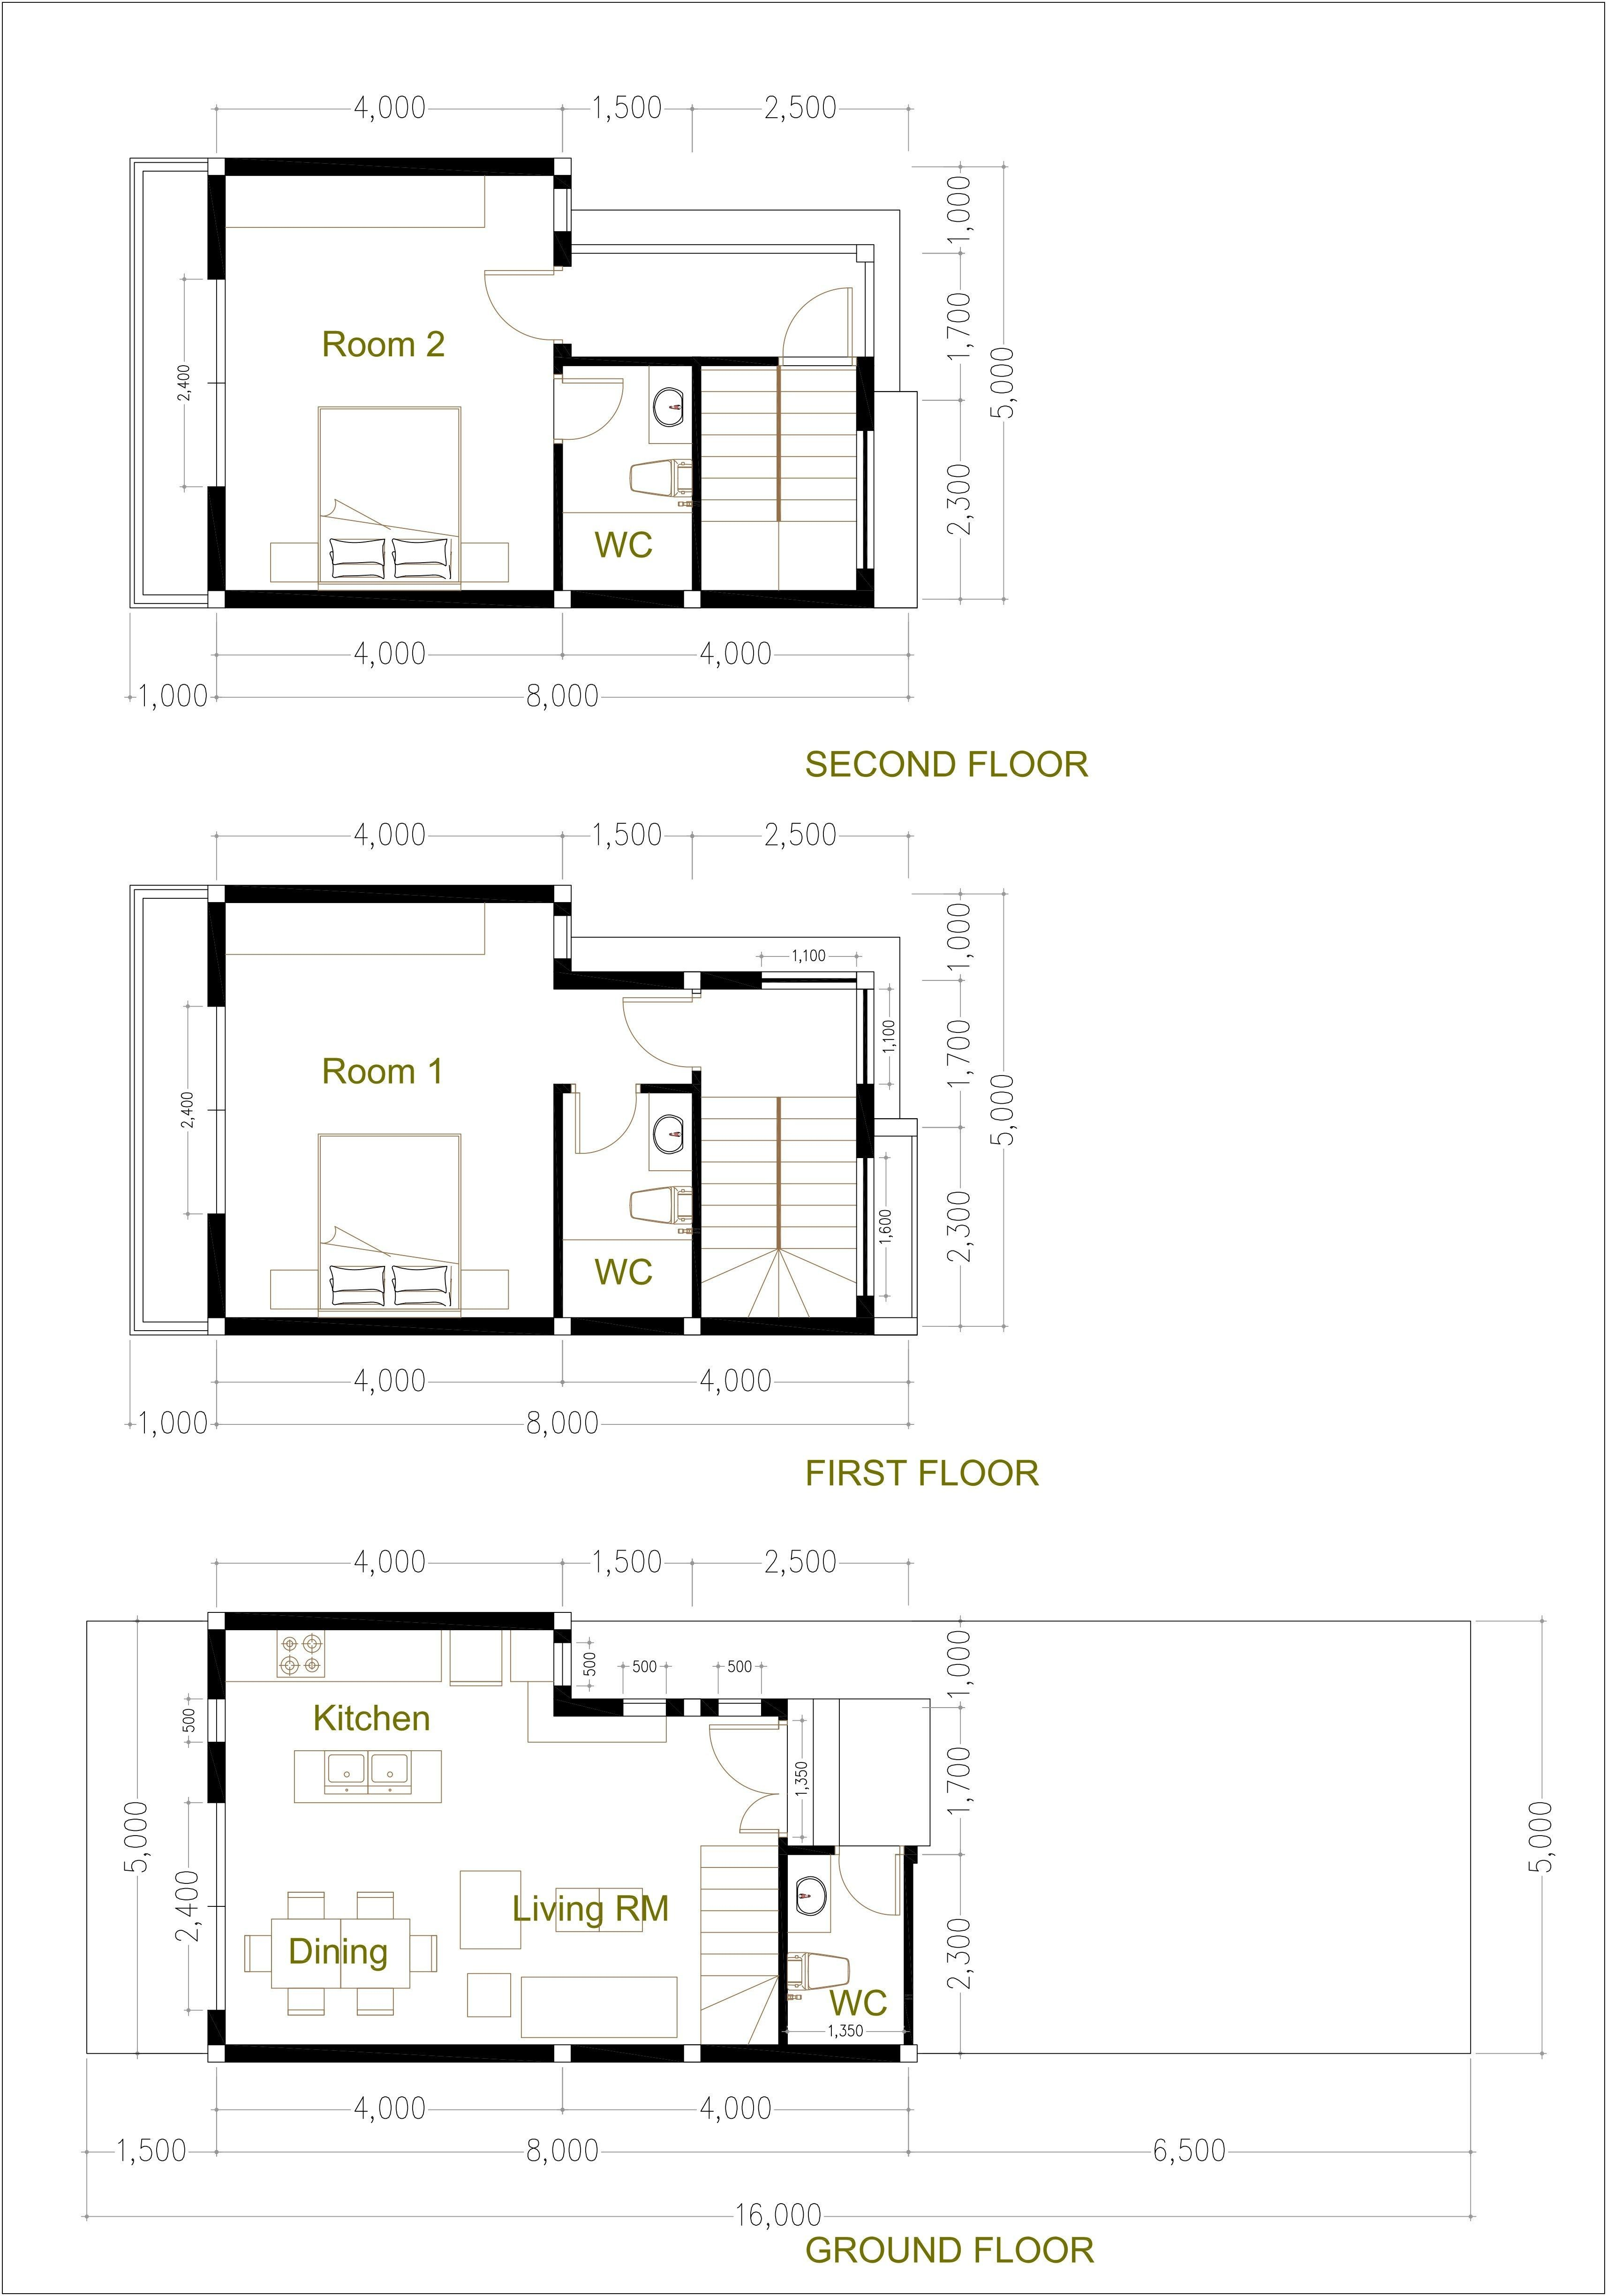 5x8m Bedroom Home Plan Samphoas Tiny Tinyhomesplans2bedroom 2 Bedroom Tiny Home Plan 5x8m Samphoas Plan In 2020 Tiny House Plans House Plans Two Bedroom House